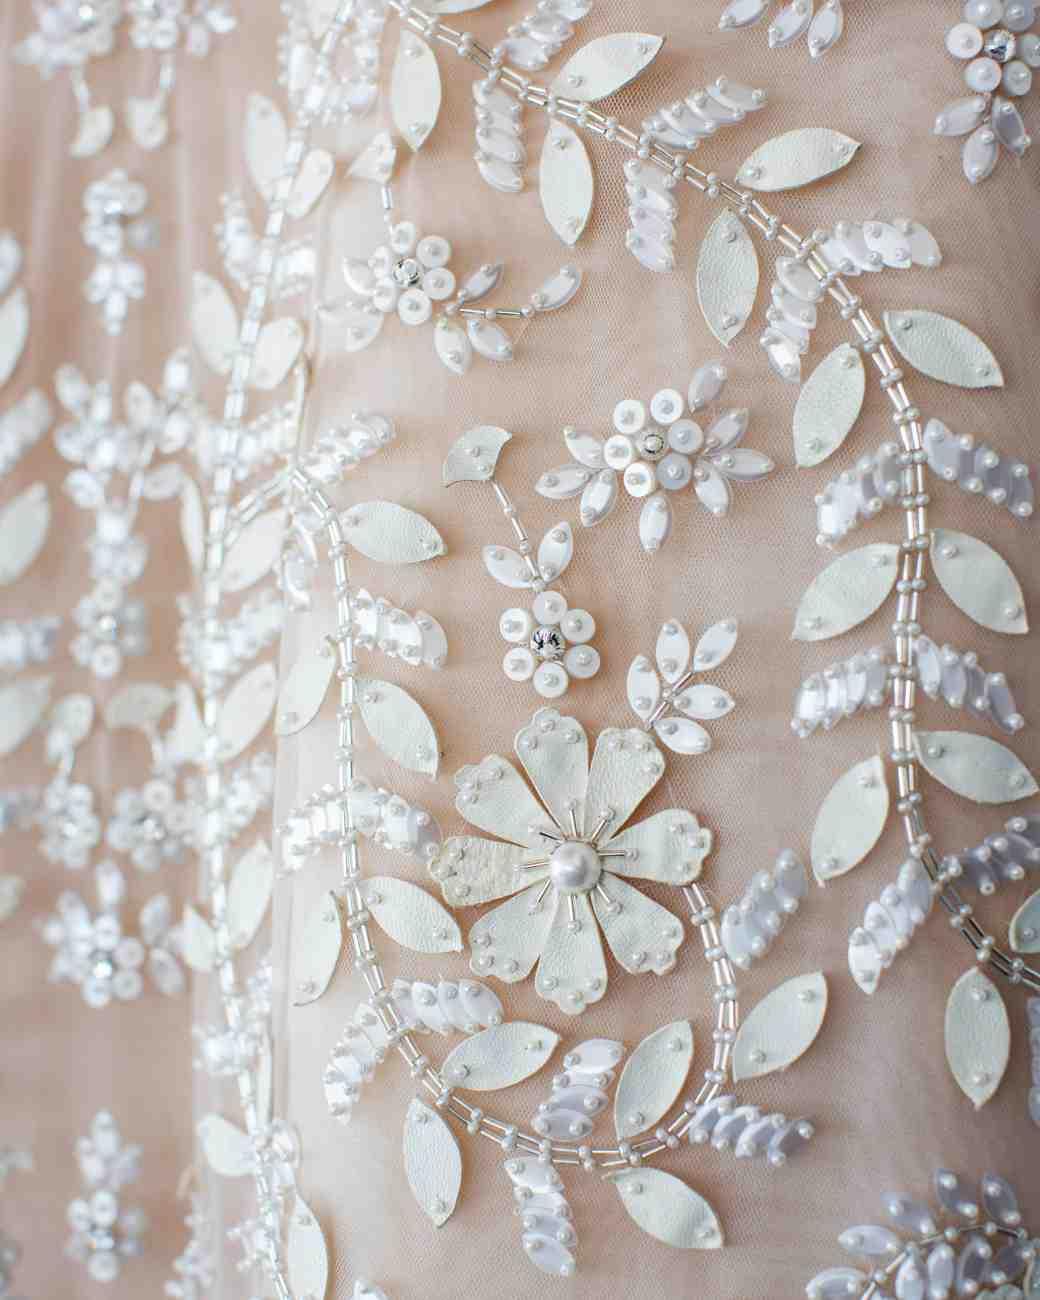 emily-josh-wedding-dress-0238-s112719-0216.jpg